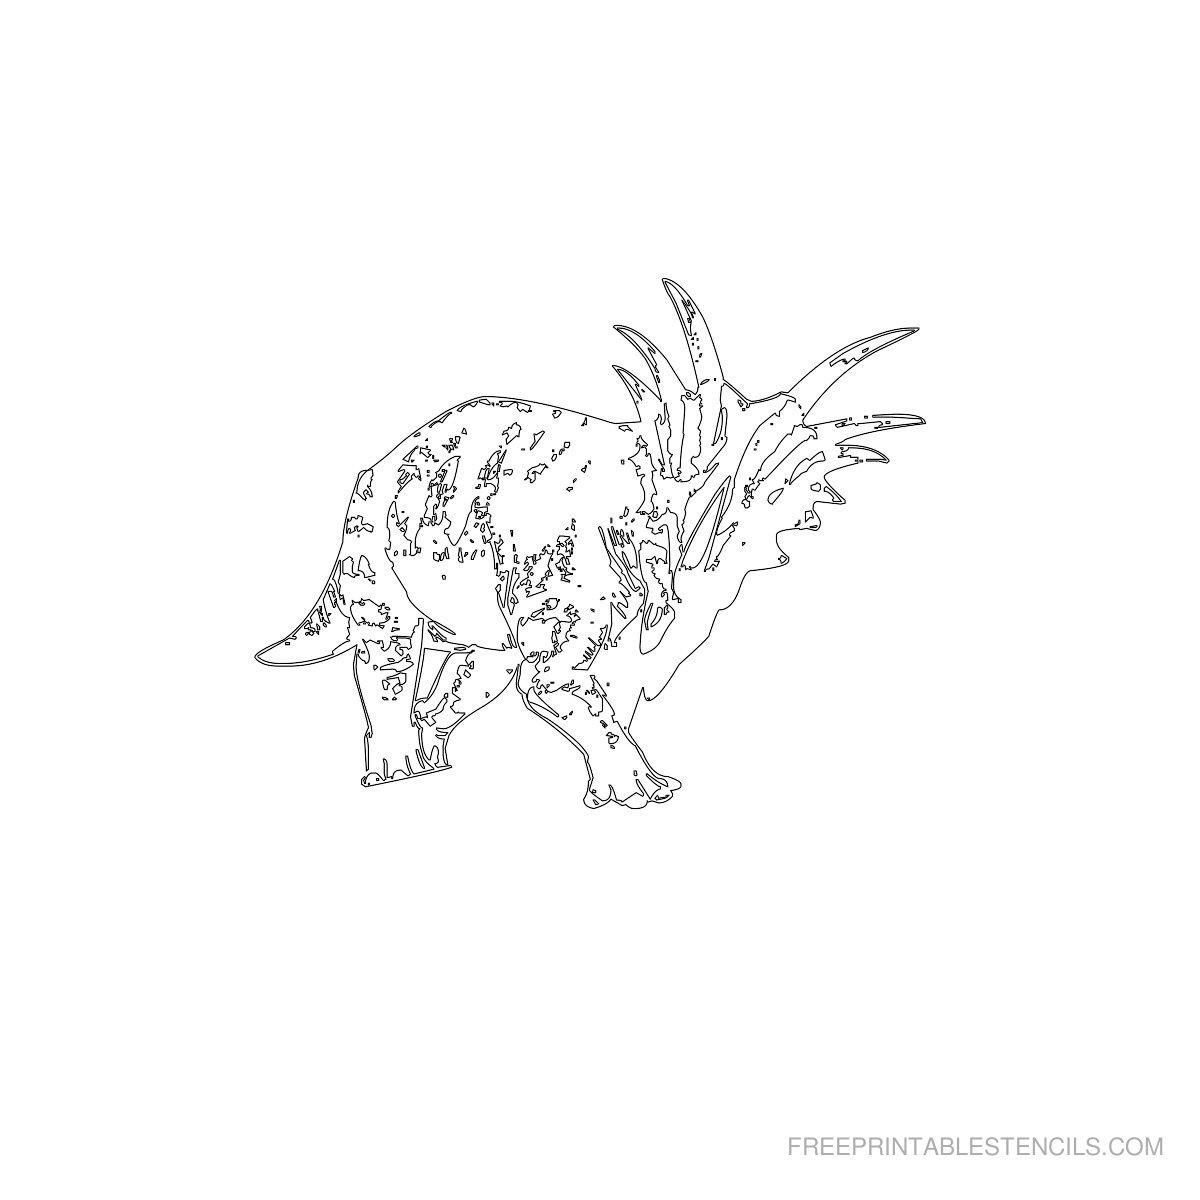 Free Printable Dinosaur Stencil D